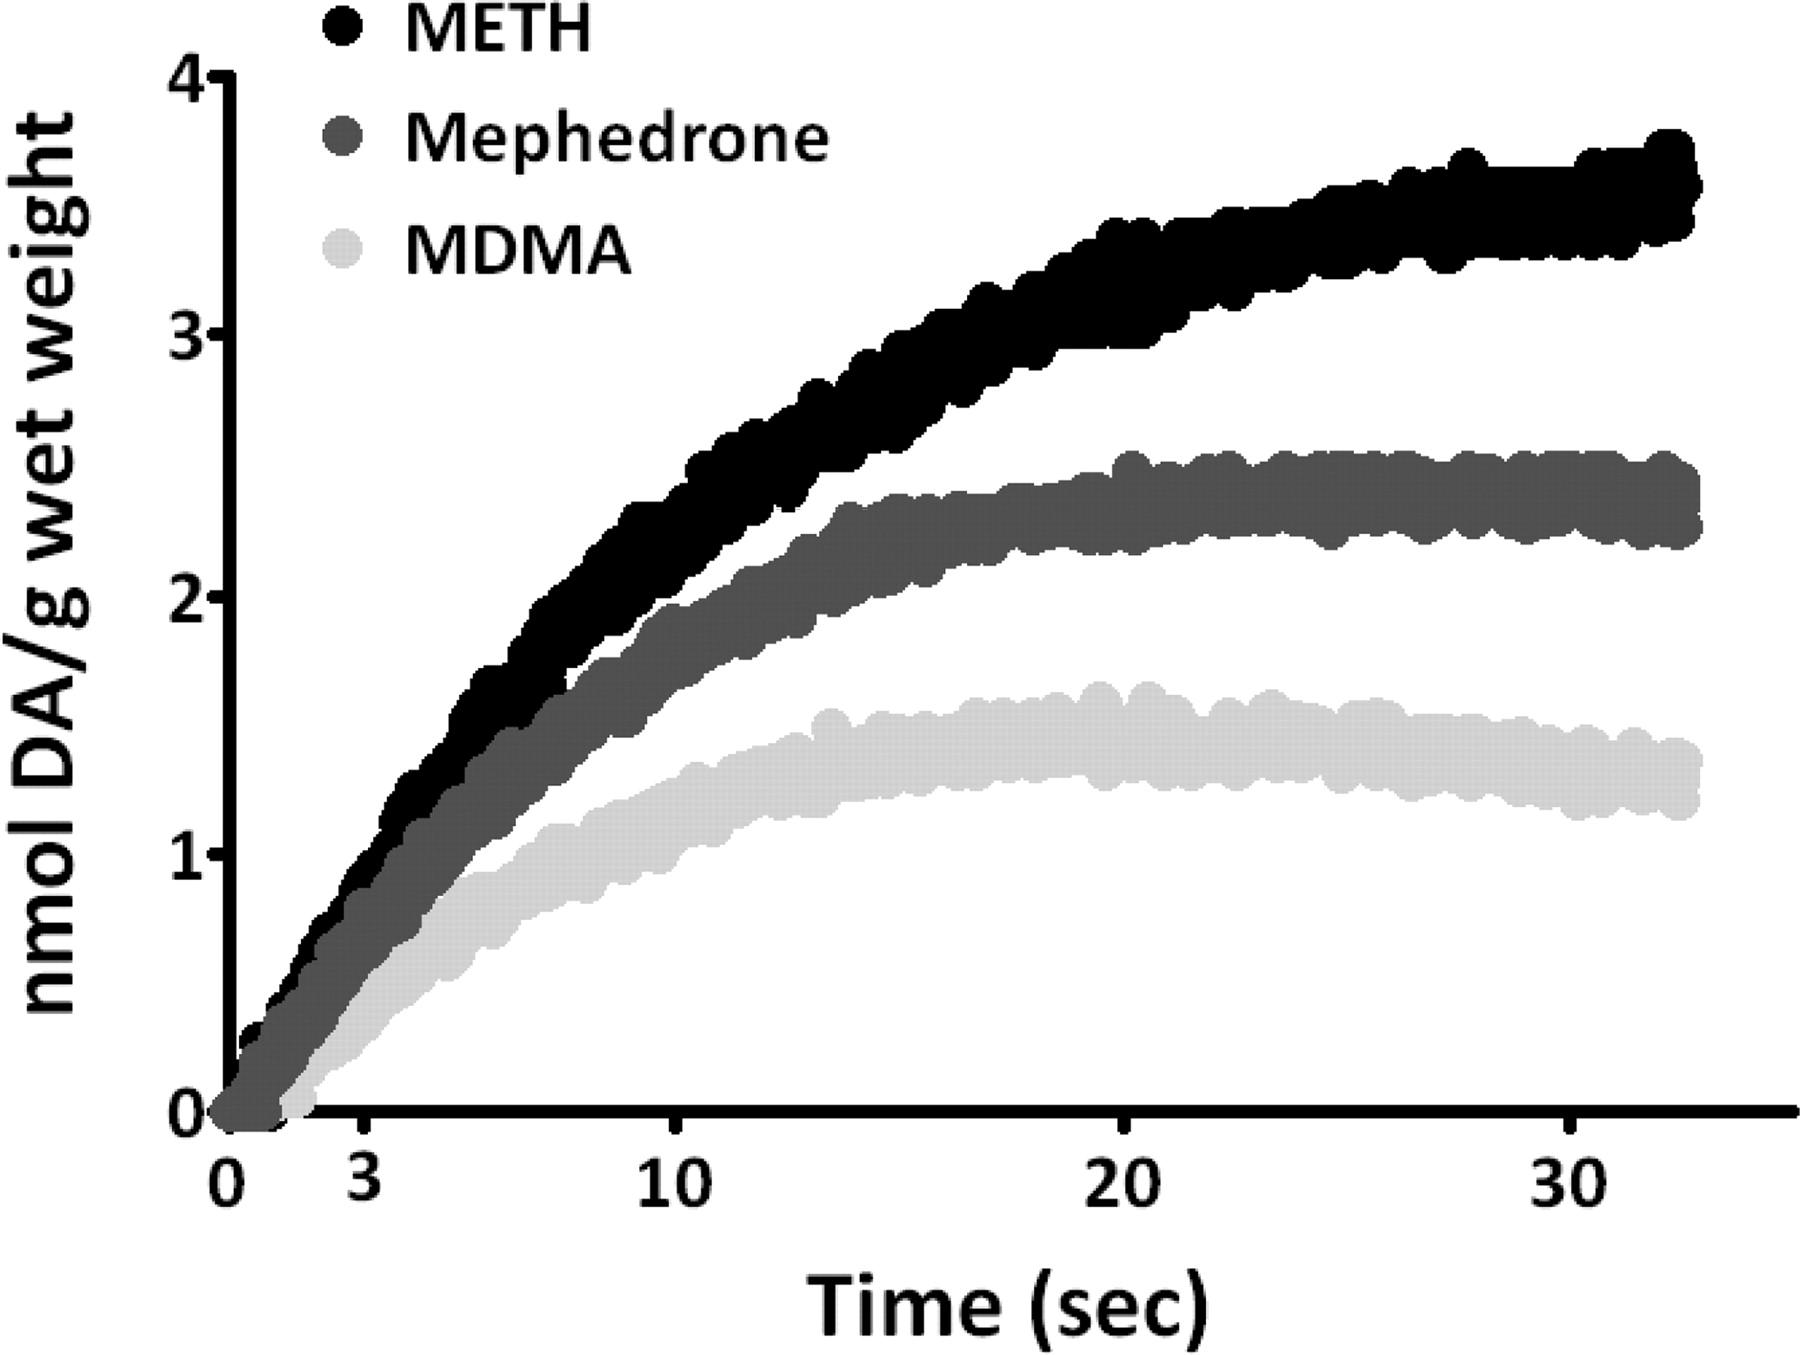 4-Methylmethcathinone (Mephedrone): Neuropharmacological Effects of